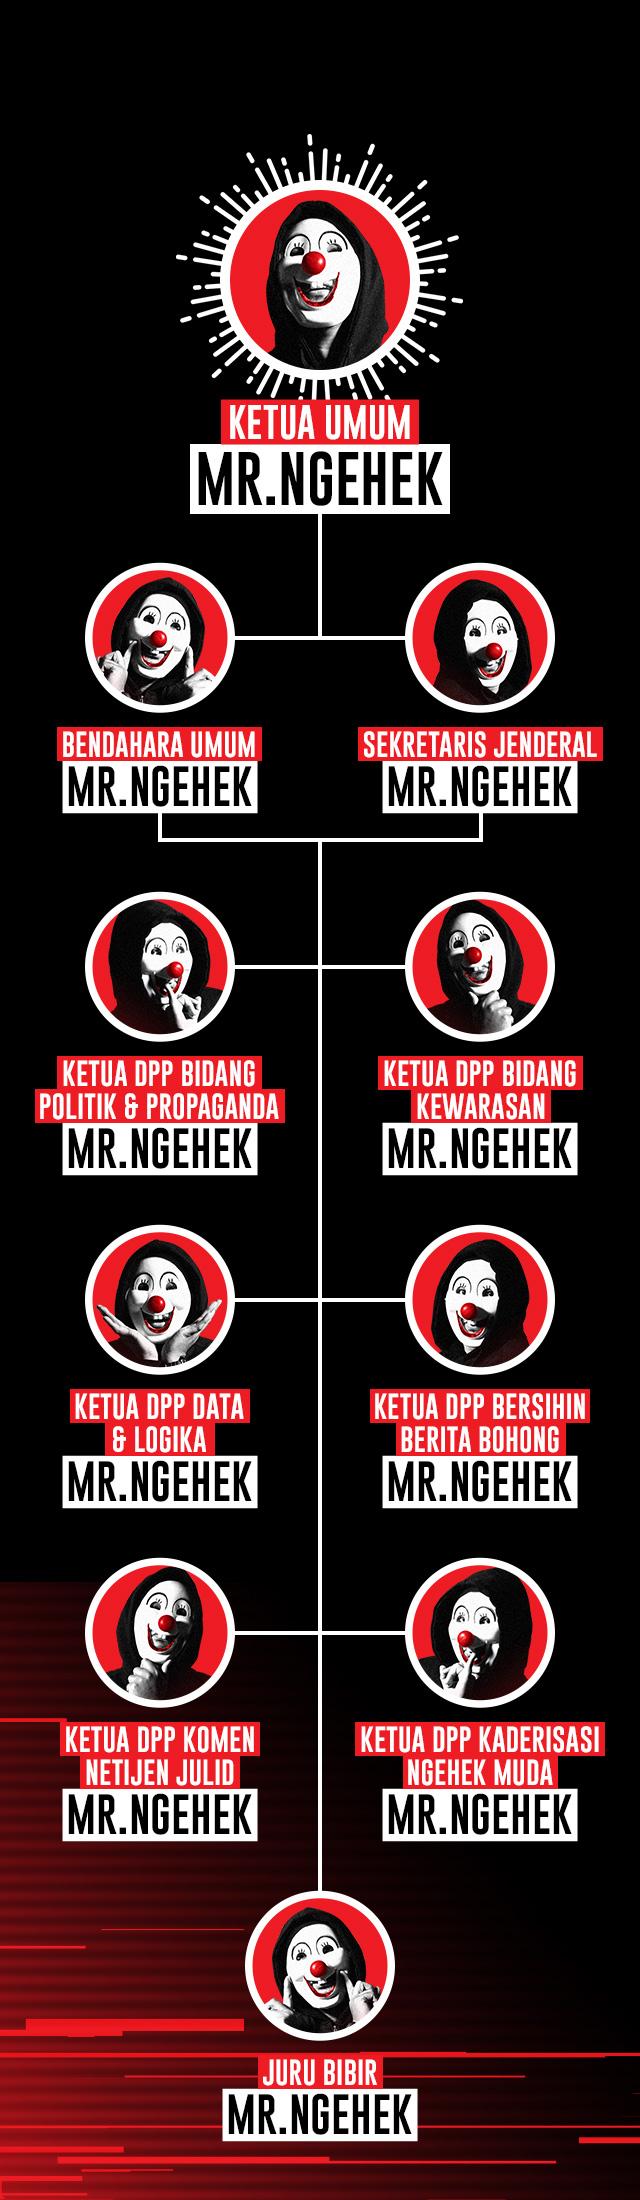 Struktur Organisasi Mr.Ngehek